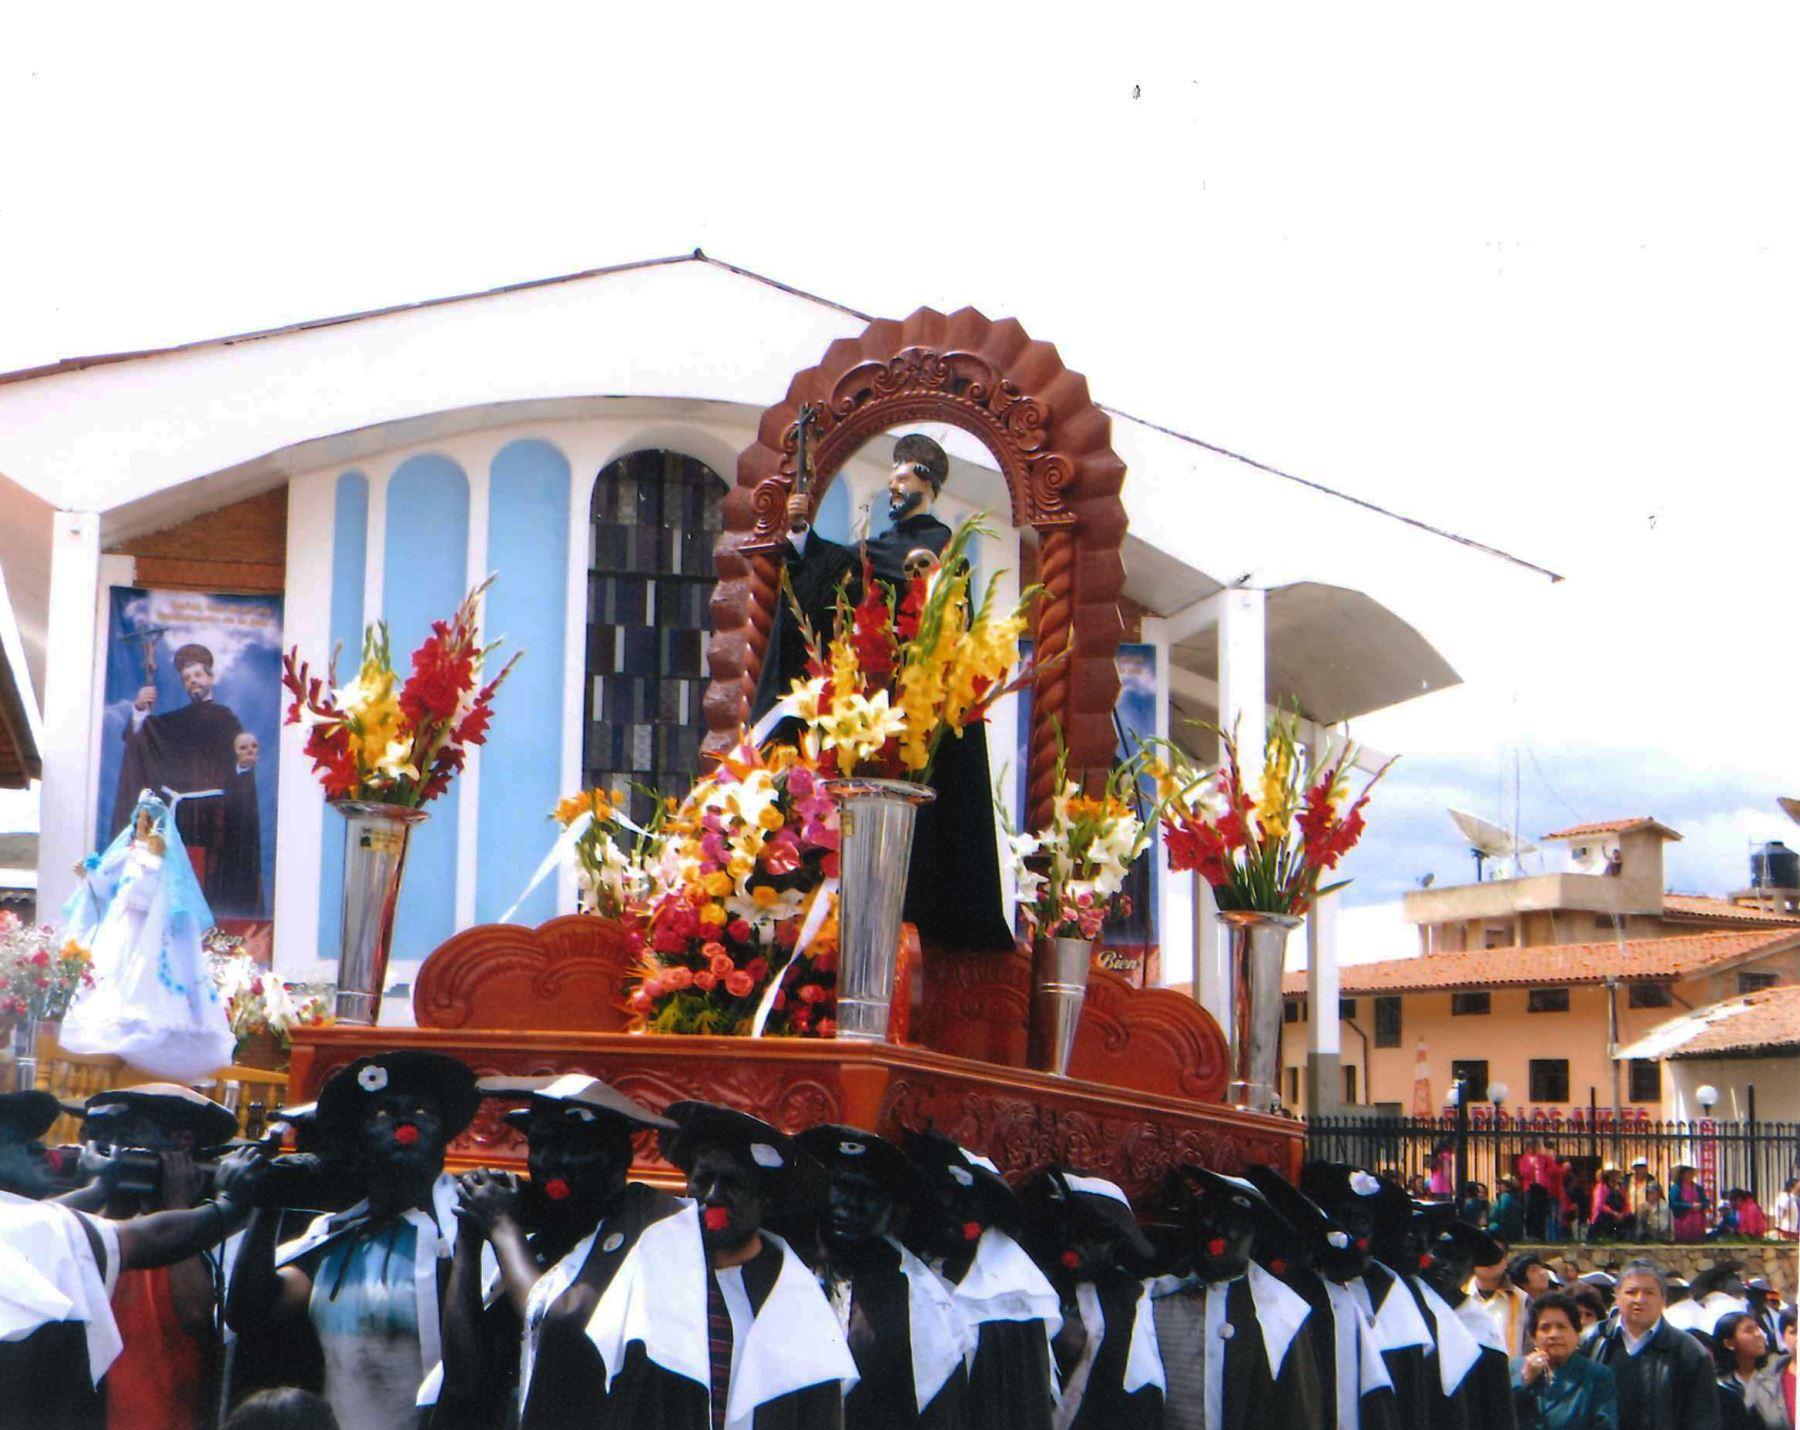 Fiesta de San Francisco de Asis de Huamachuco